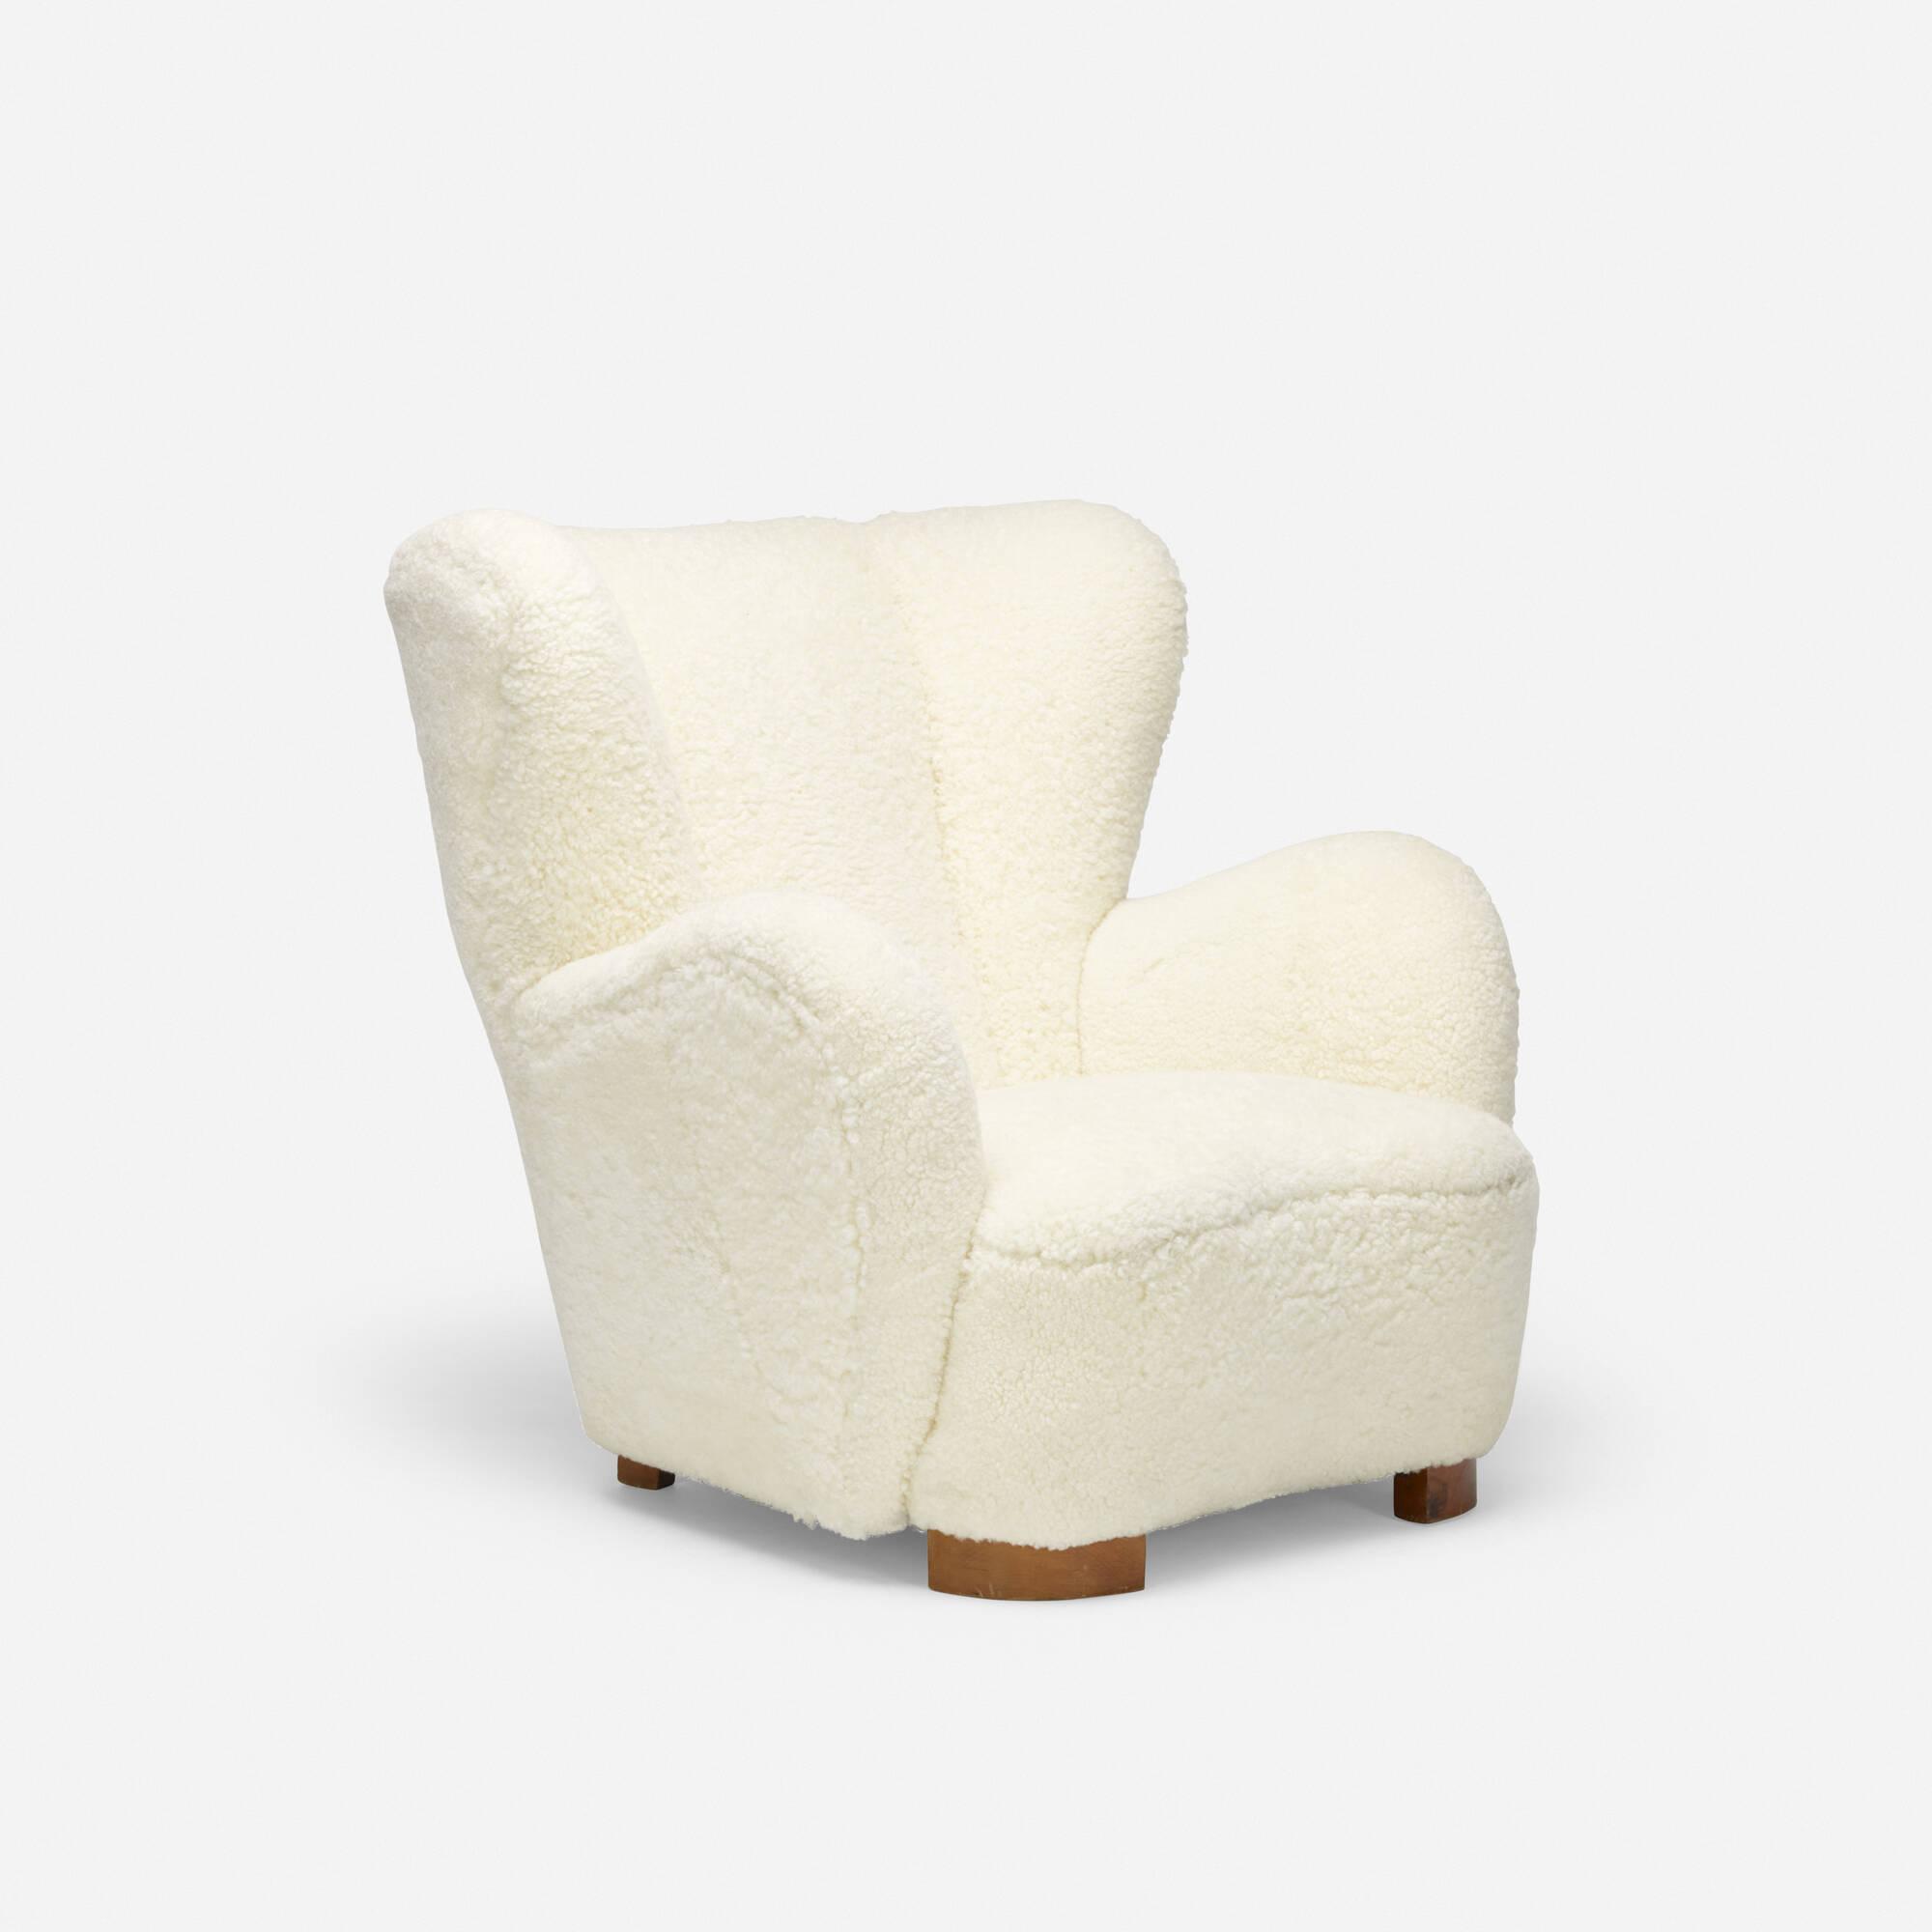 181: Flemming Lassen, attribution / lounge chair (1 of 3)